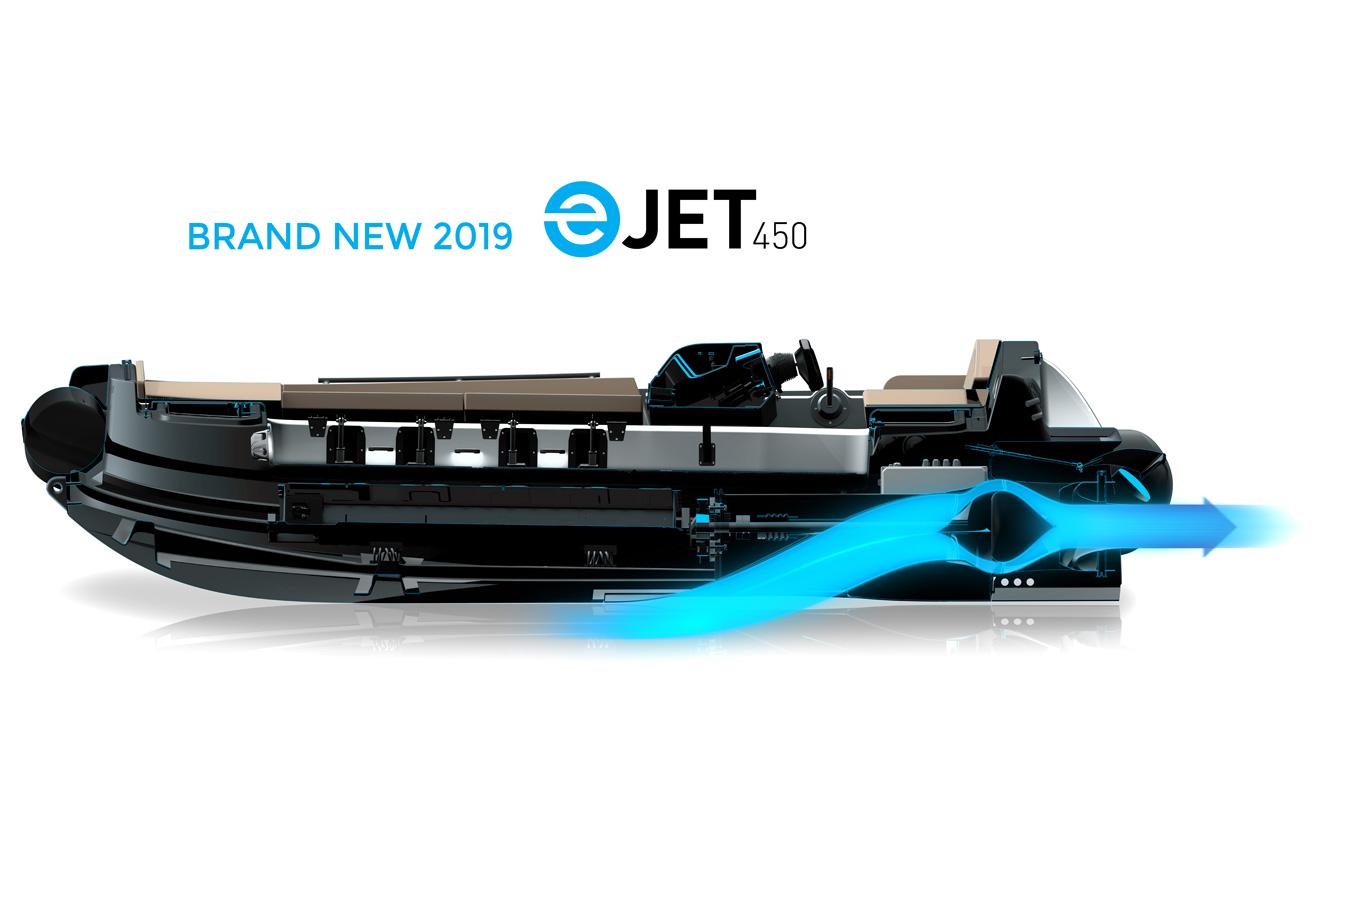 Avon Electric Jet Tender - 7zea com